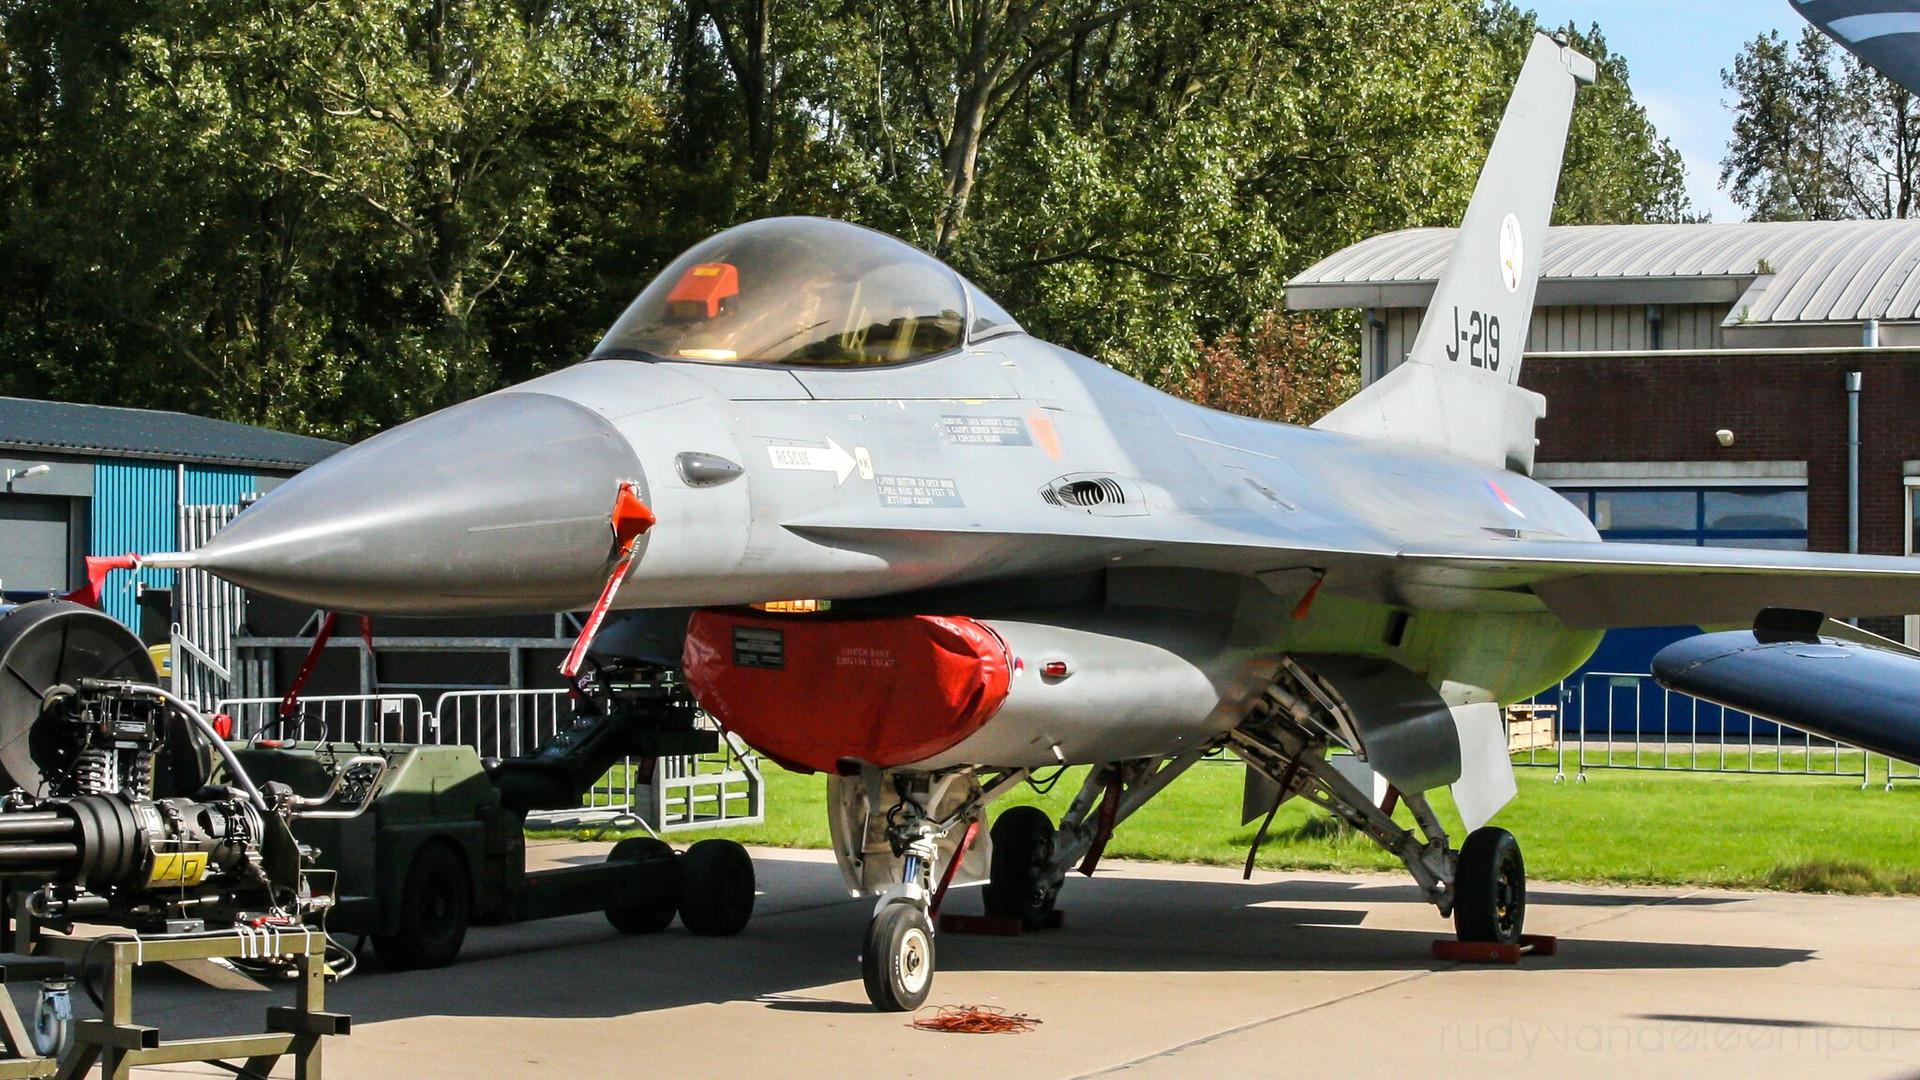 J-219   Build: 1980 - Lockheed Martin F-16 A Fighting Falcon